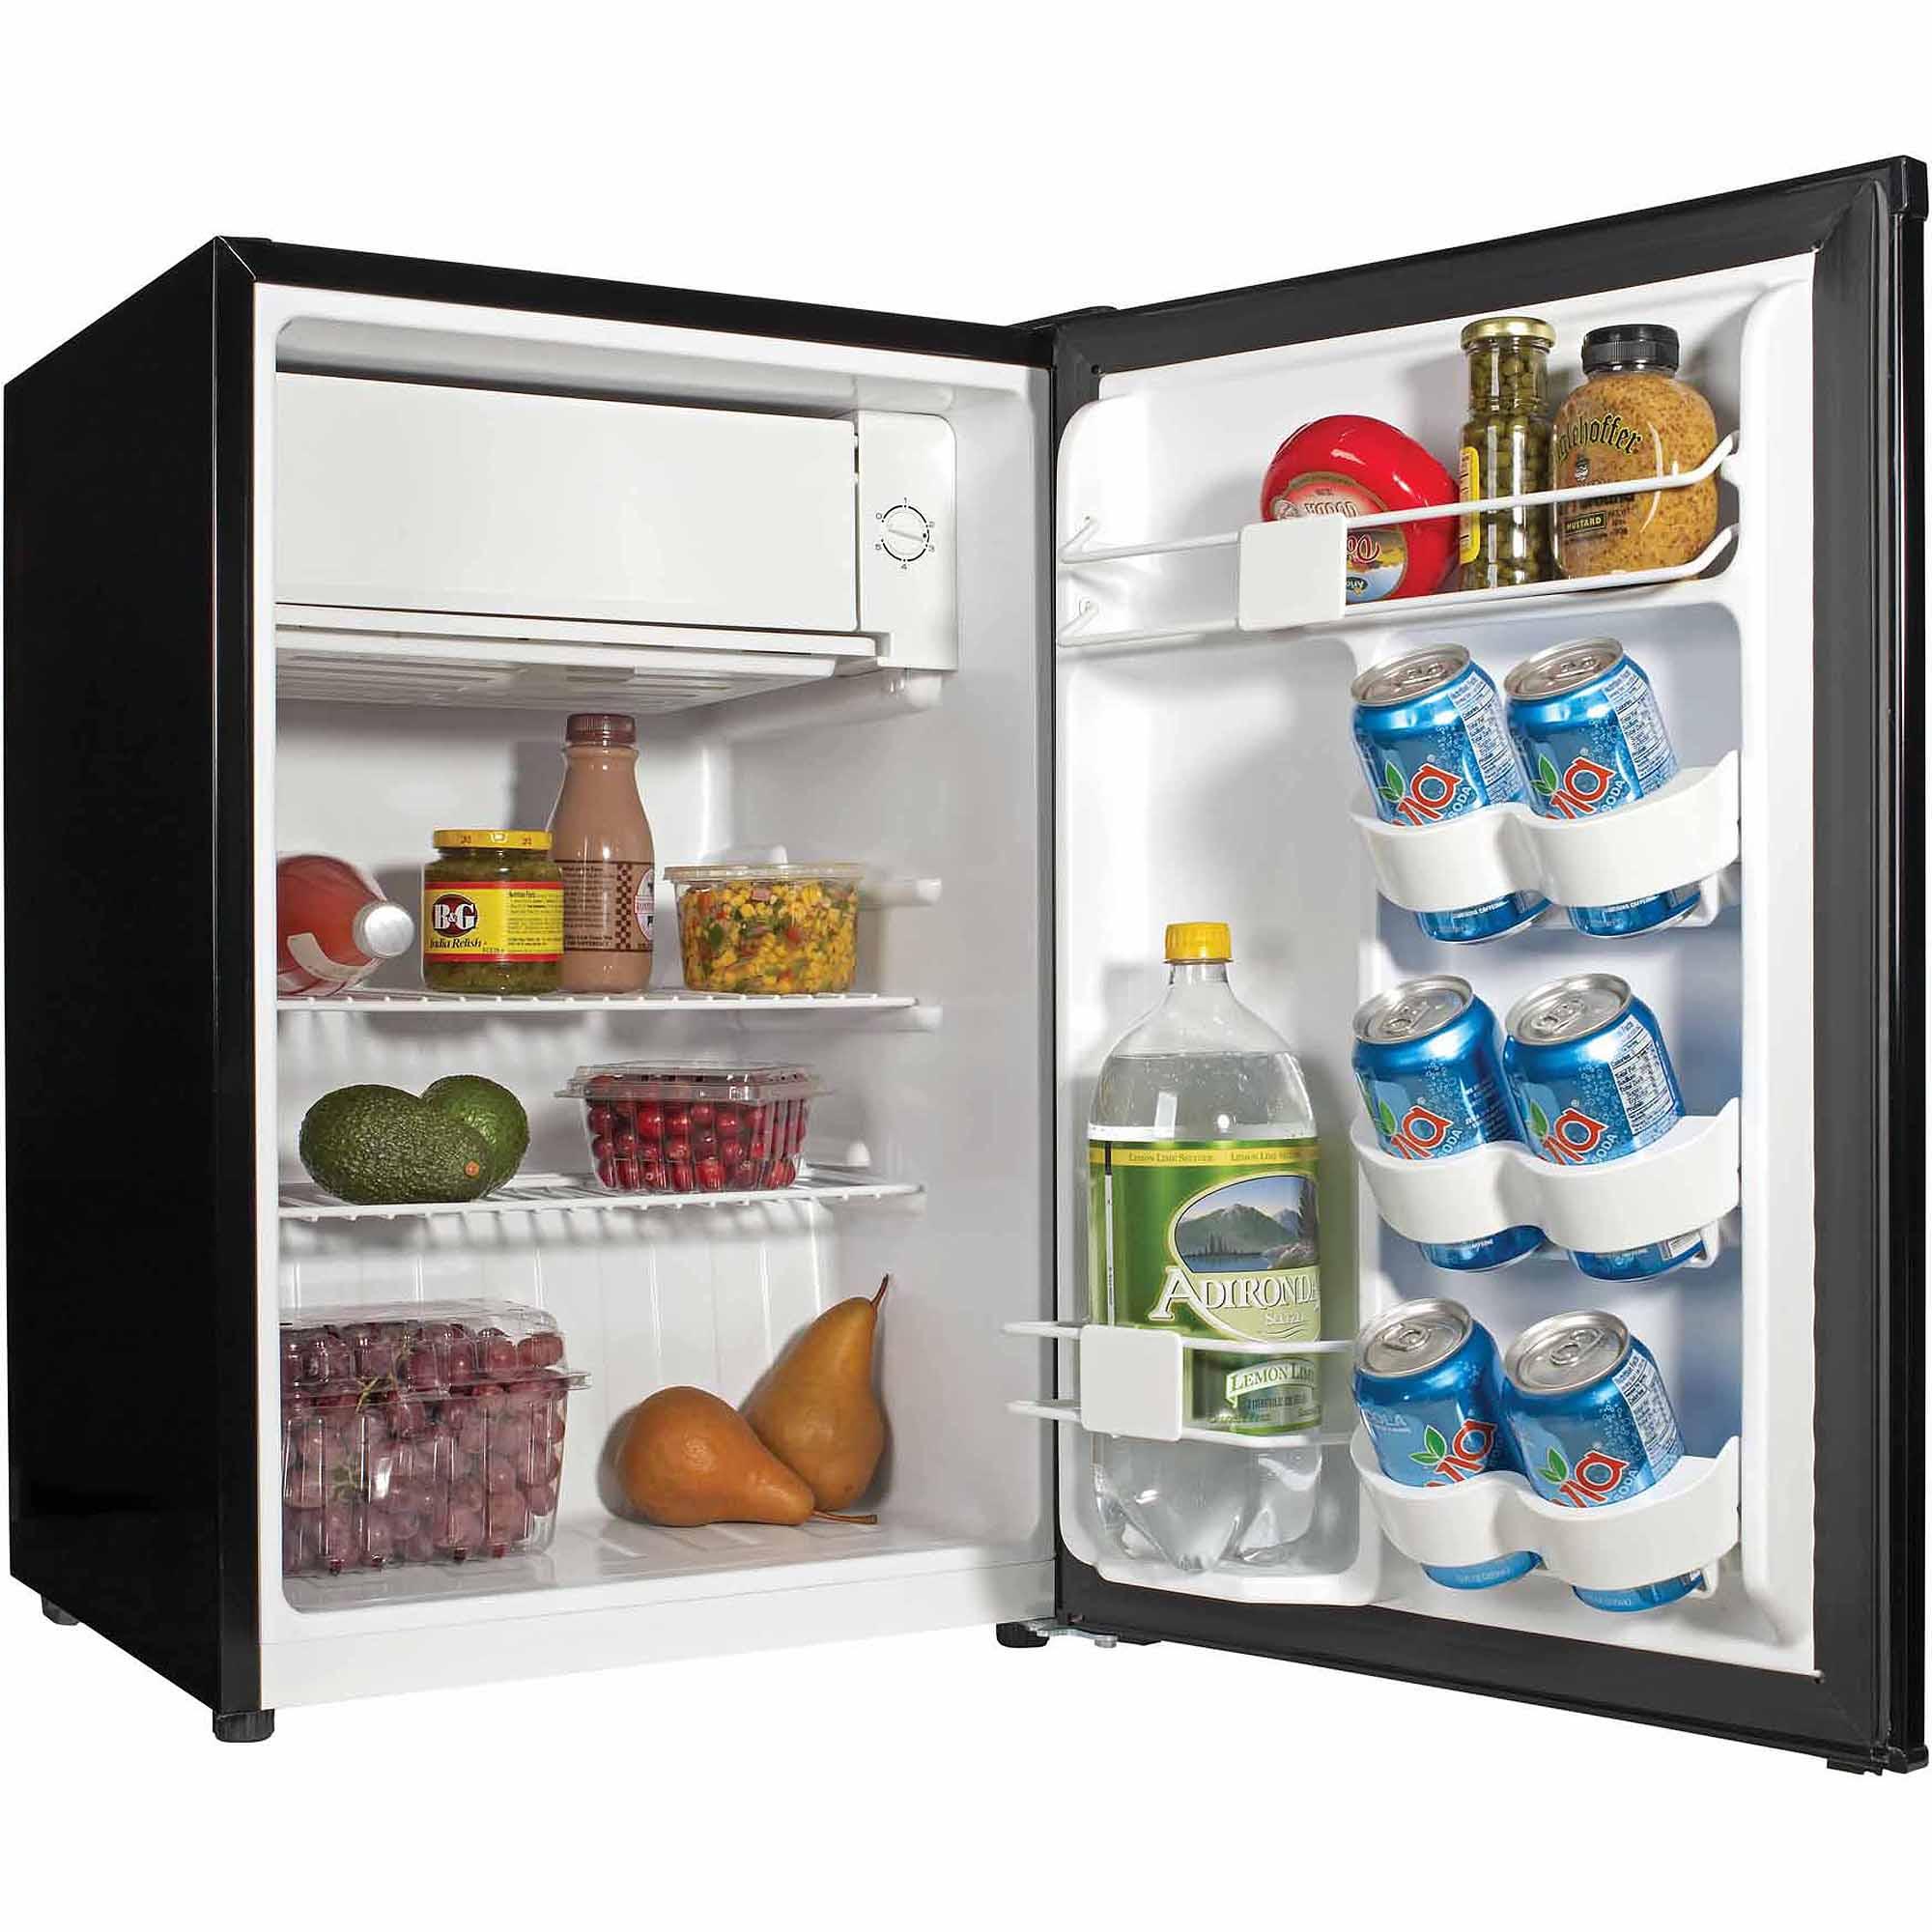 Best Dorm Room Refrigerator Freezer